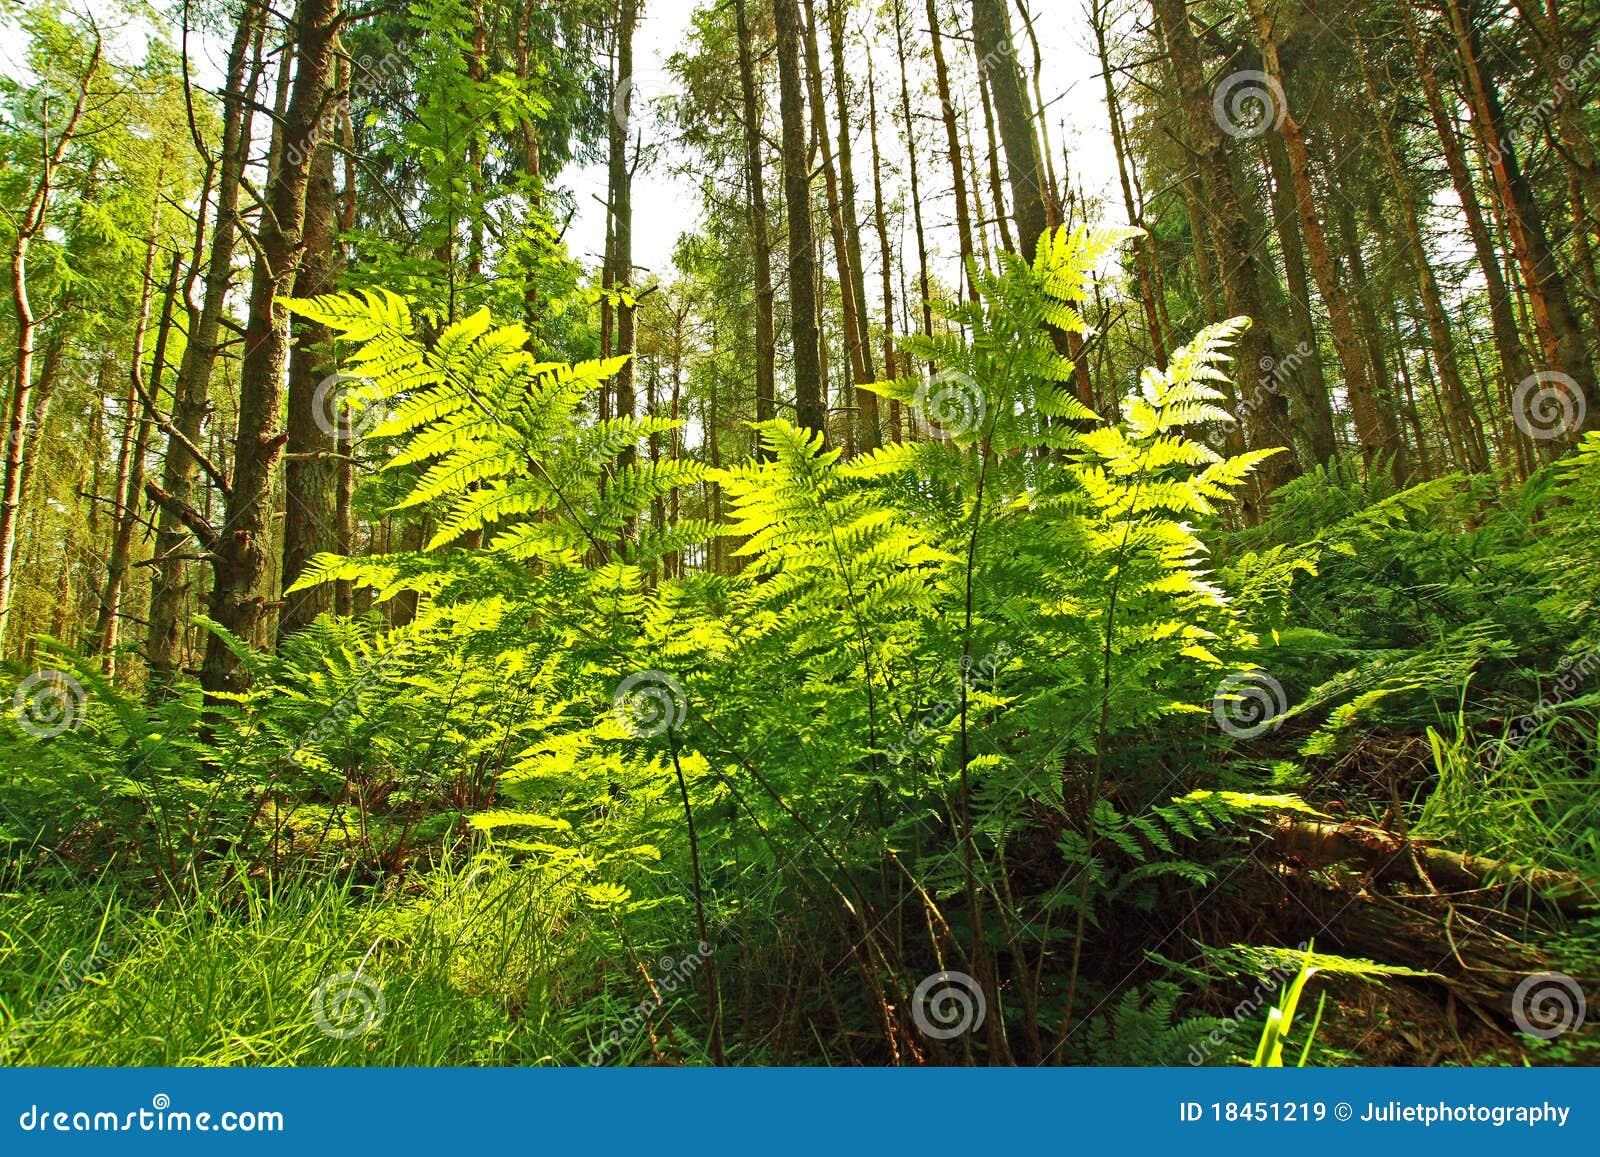 Beautifufl Spring forest